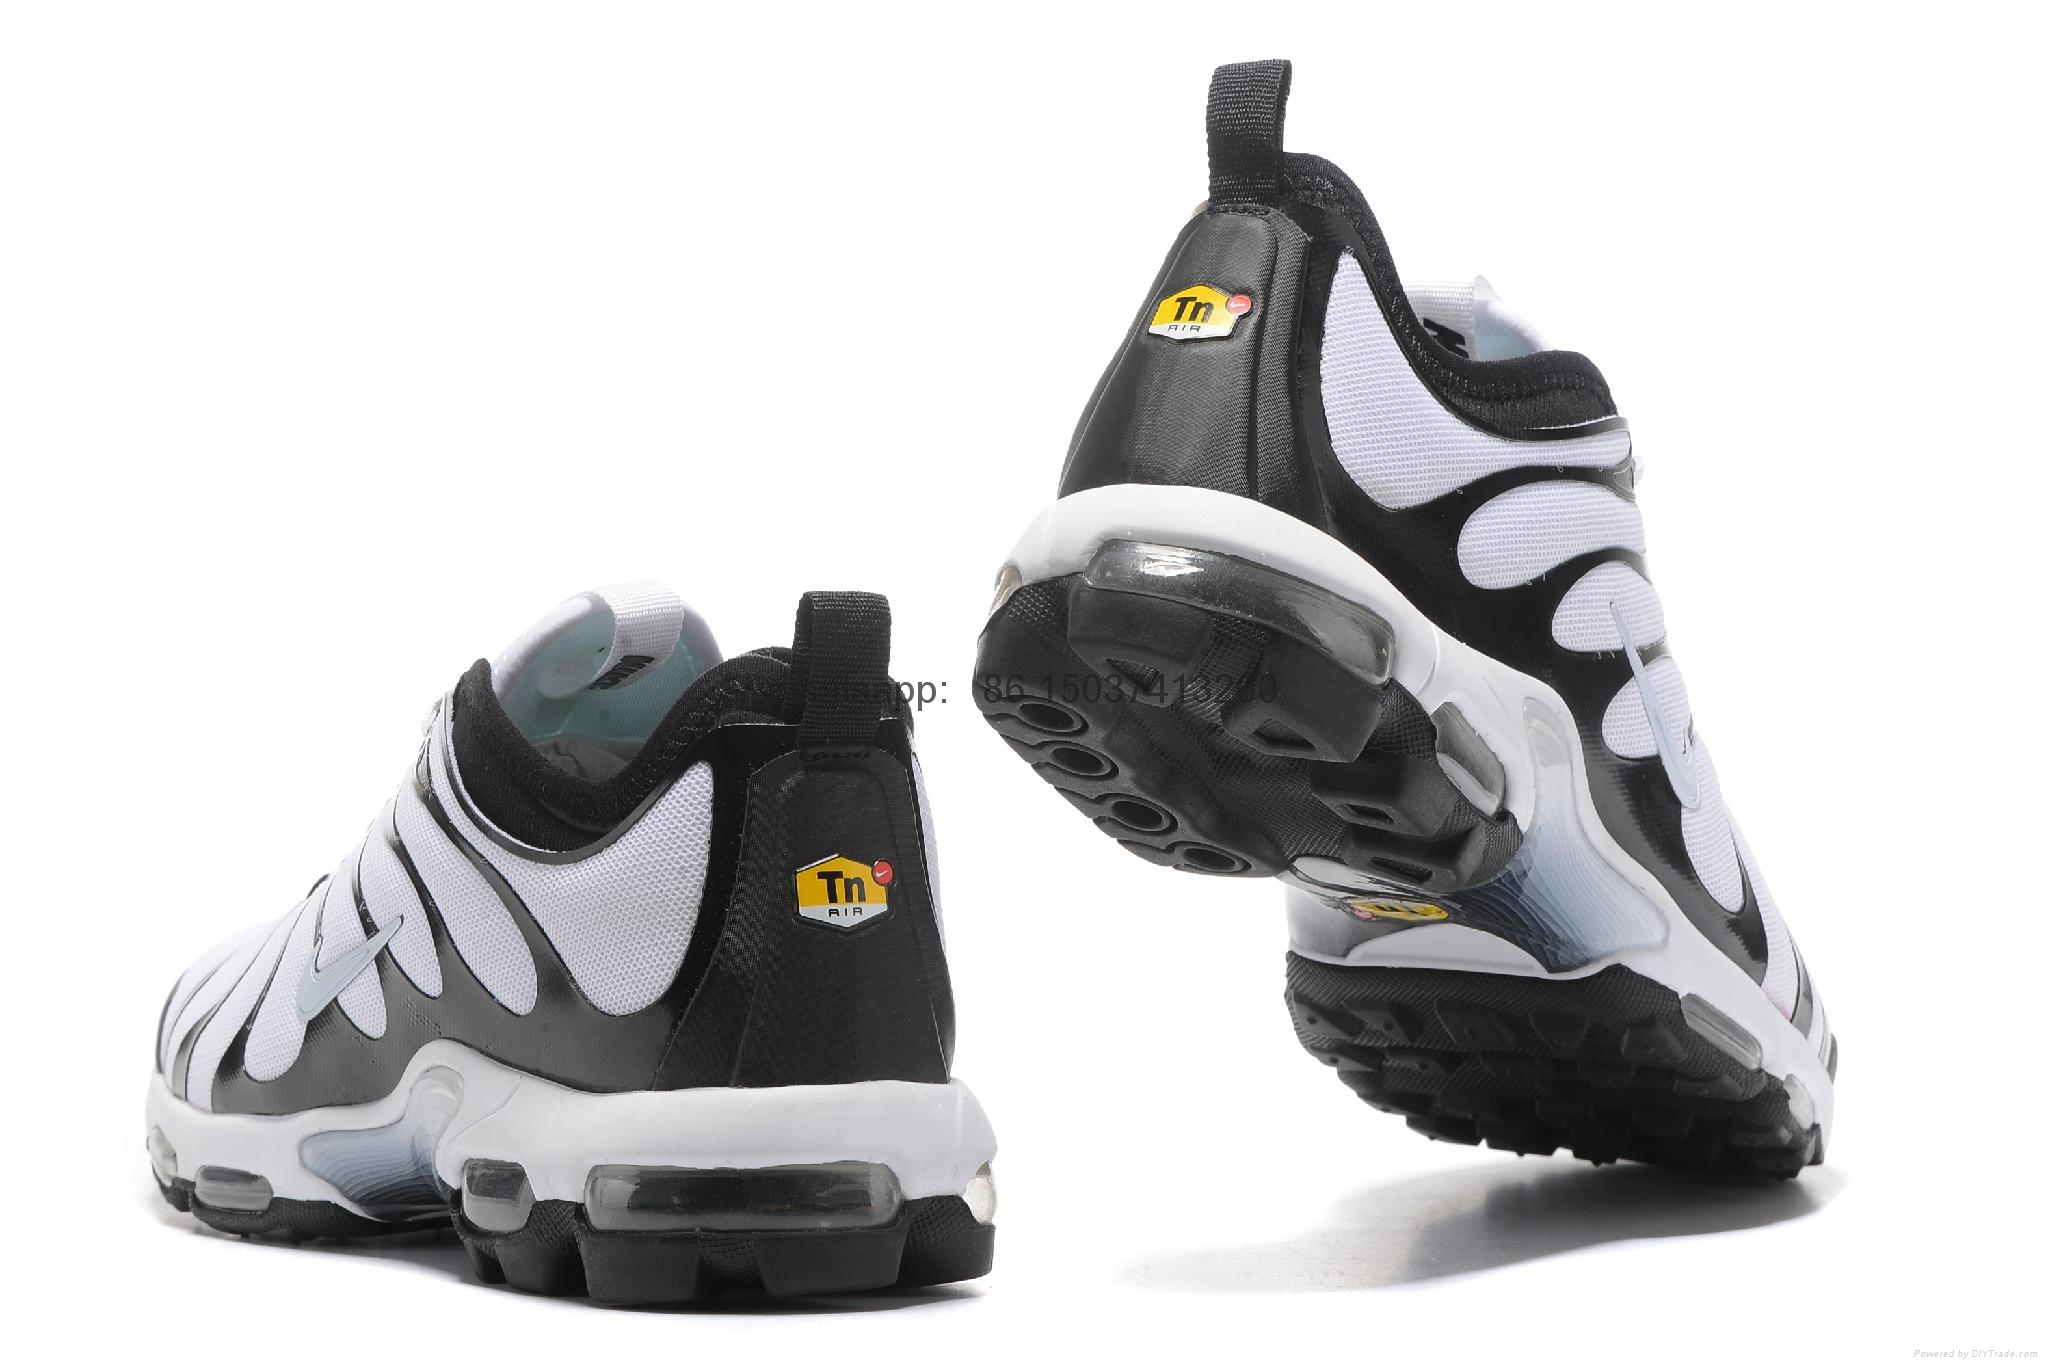 Wholesale Nike Air Max Tn Shoes